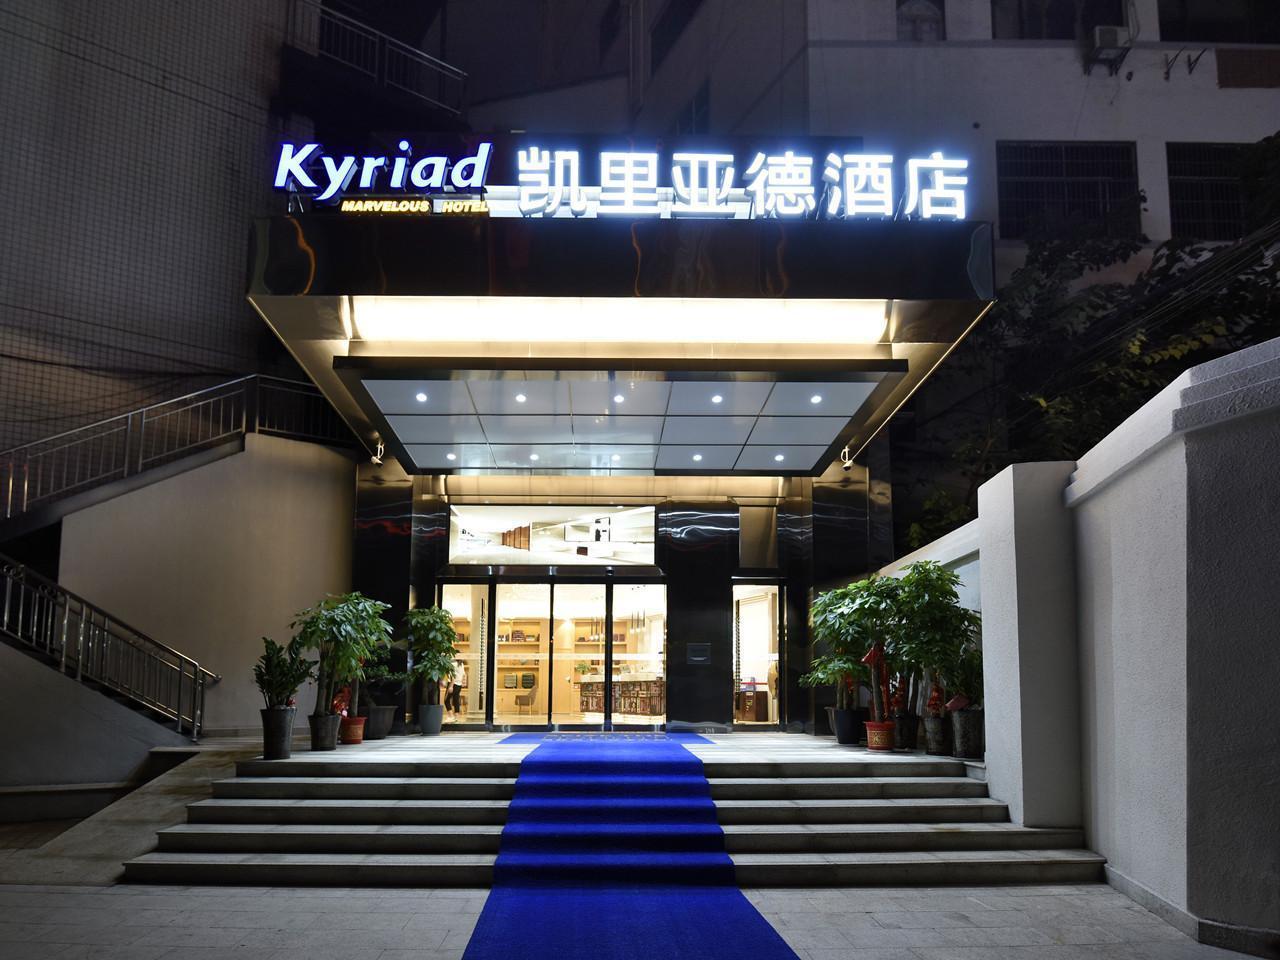 Kyriad Marvelous Hotel·Changsha Furong Square